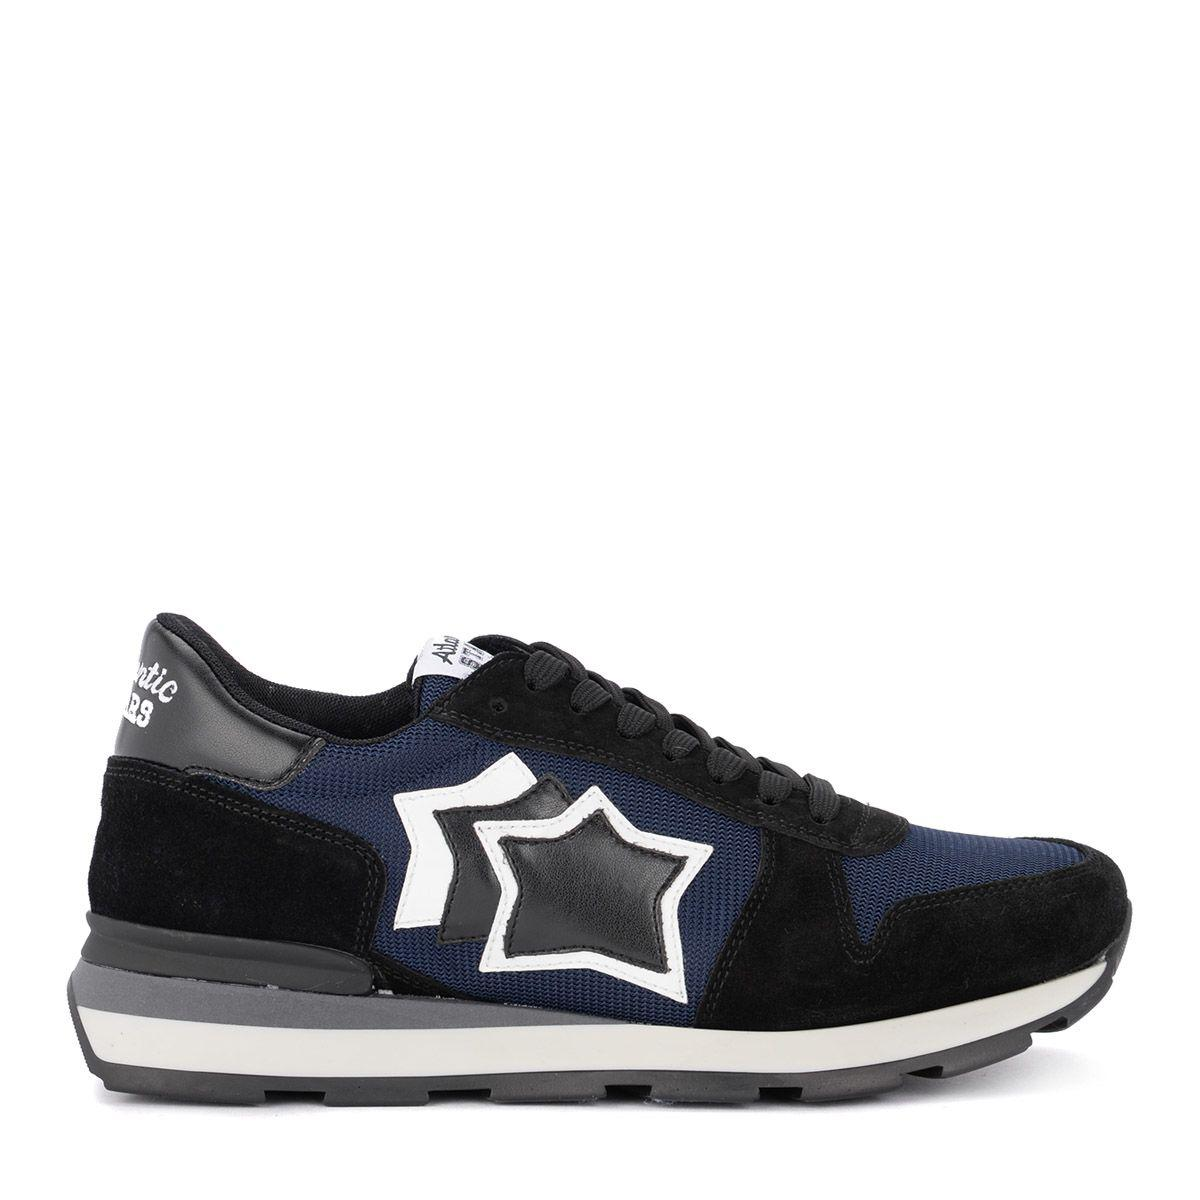 Atlantic Stars Sirius Blue Mesh And Black Suede Sneaker In Multicolor